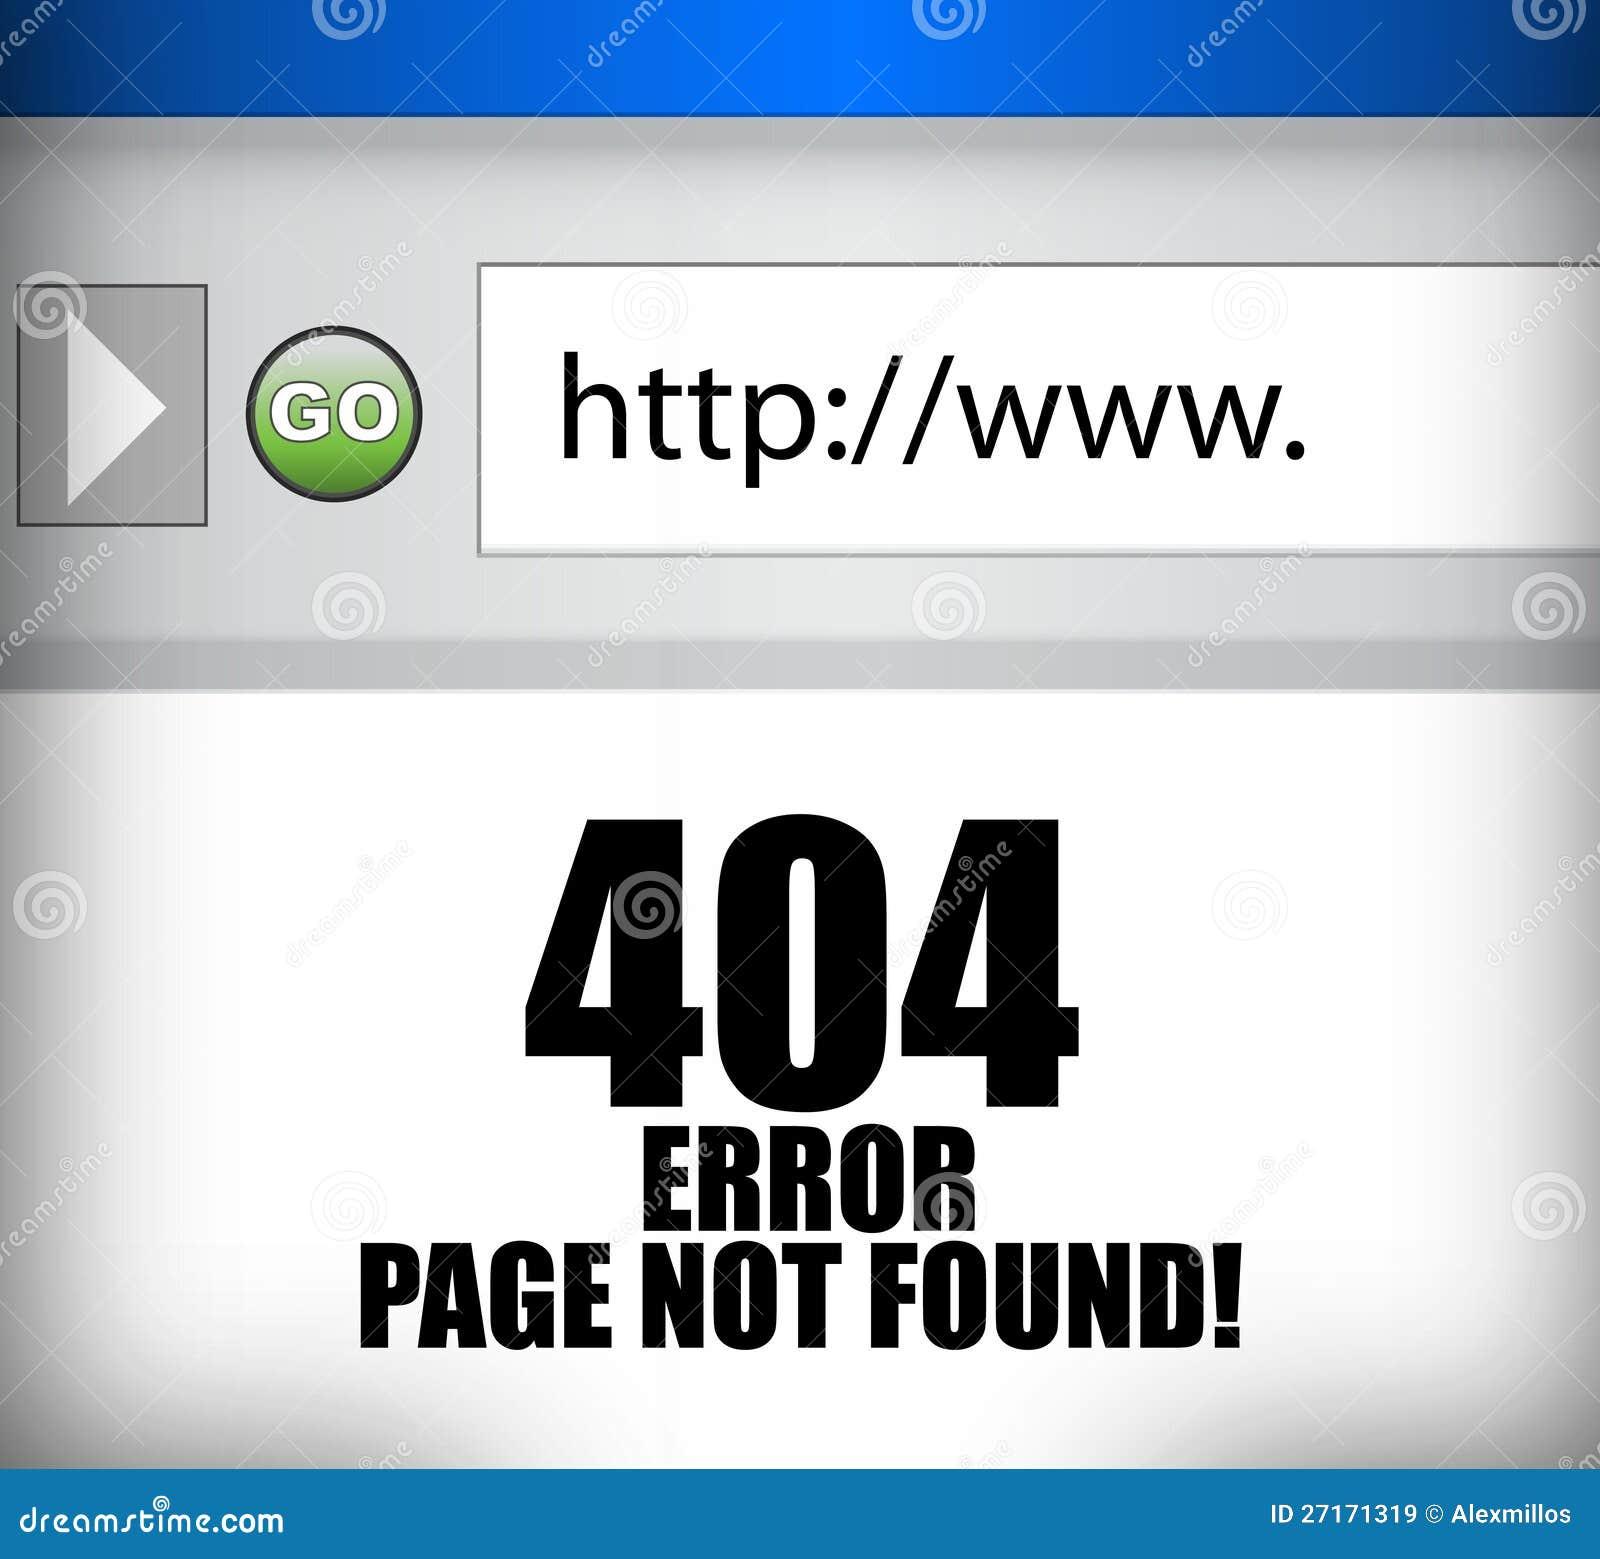 object not found error 404 in xampp download